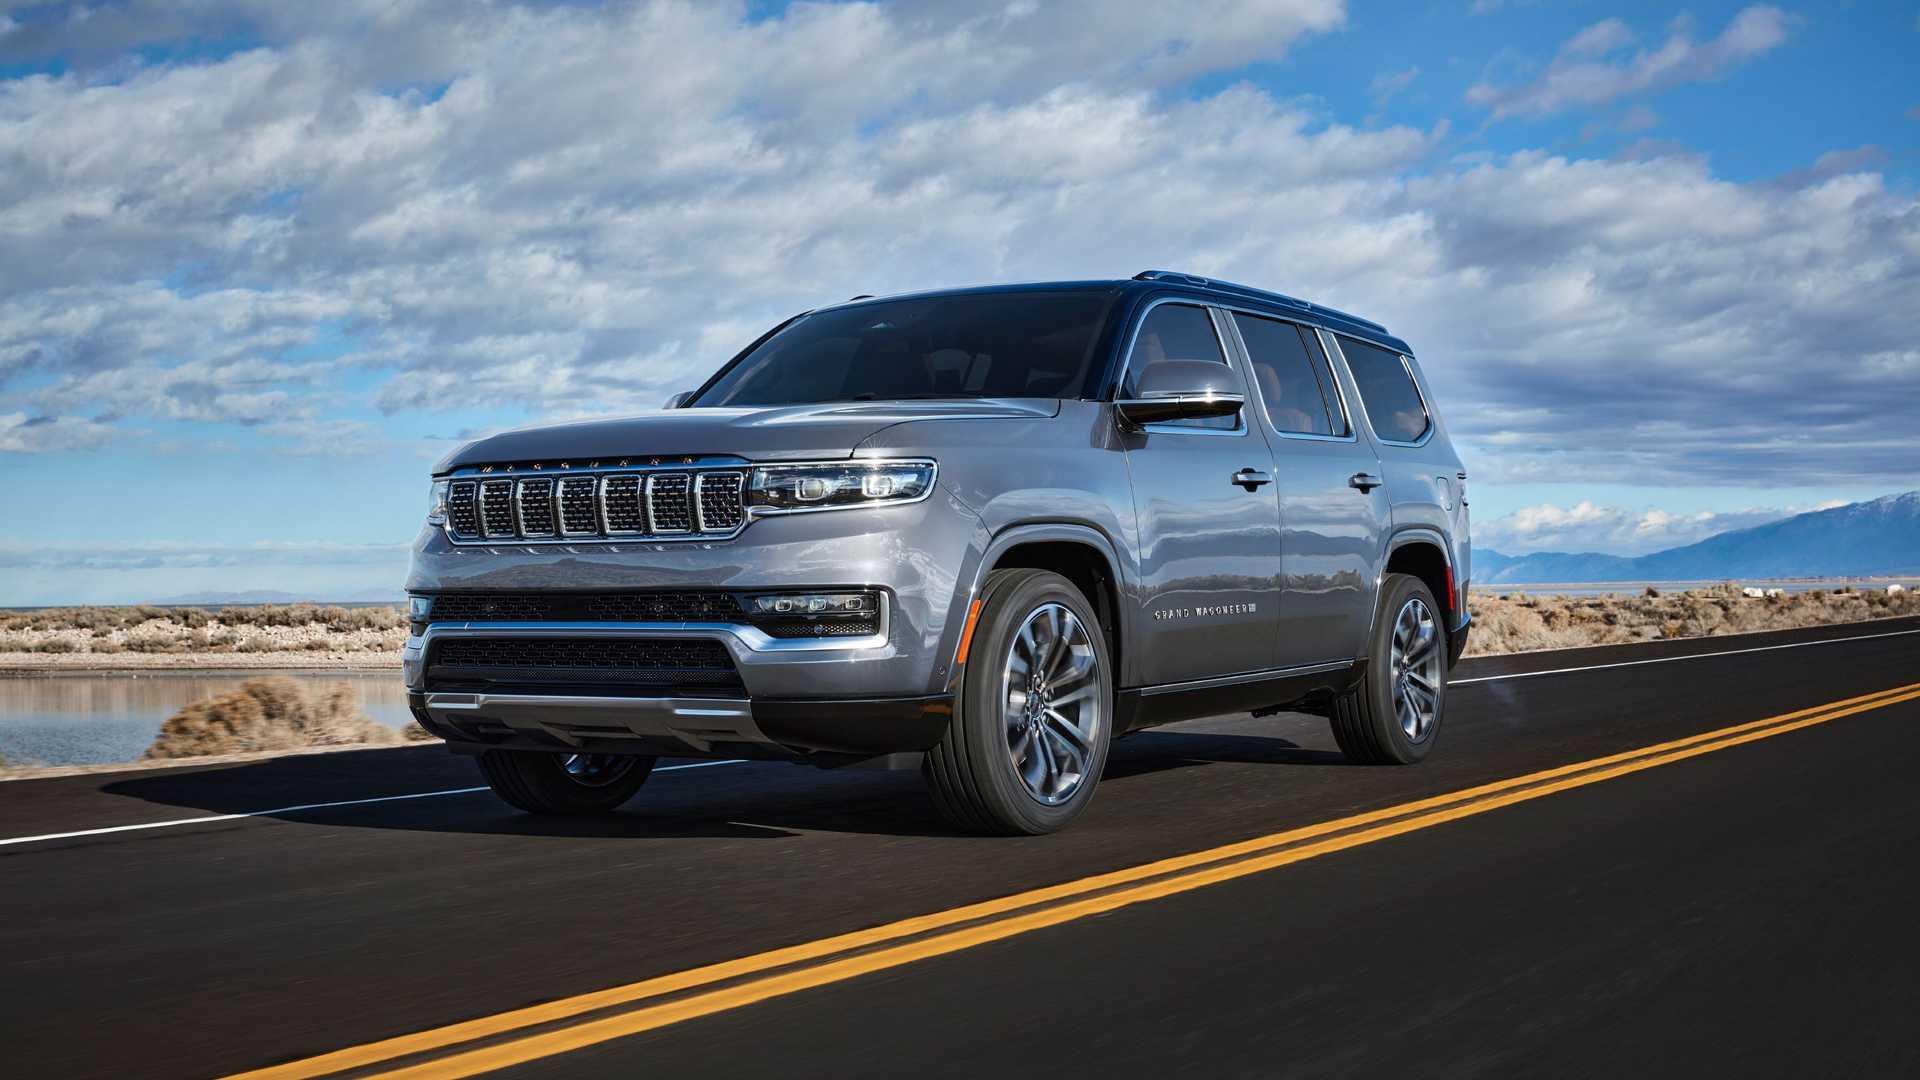 2022-jeep-grand-wagoneer-exterior-front-quarter-10